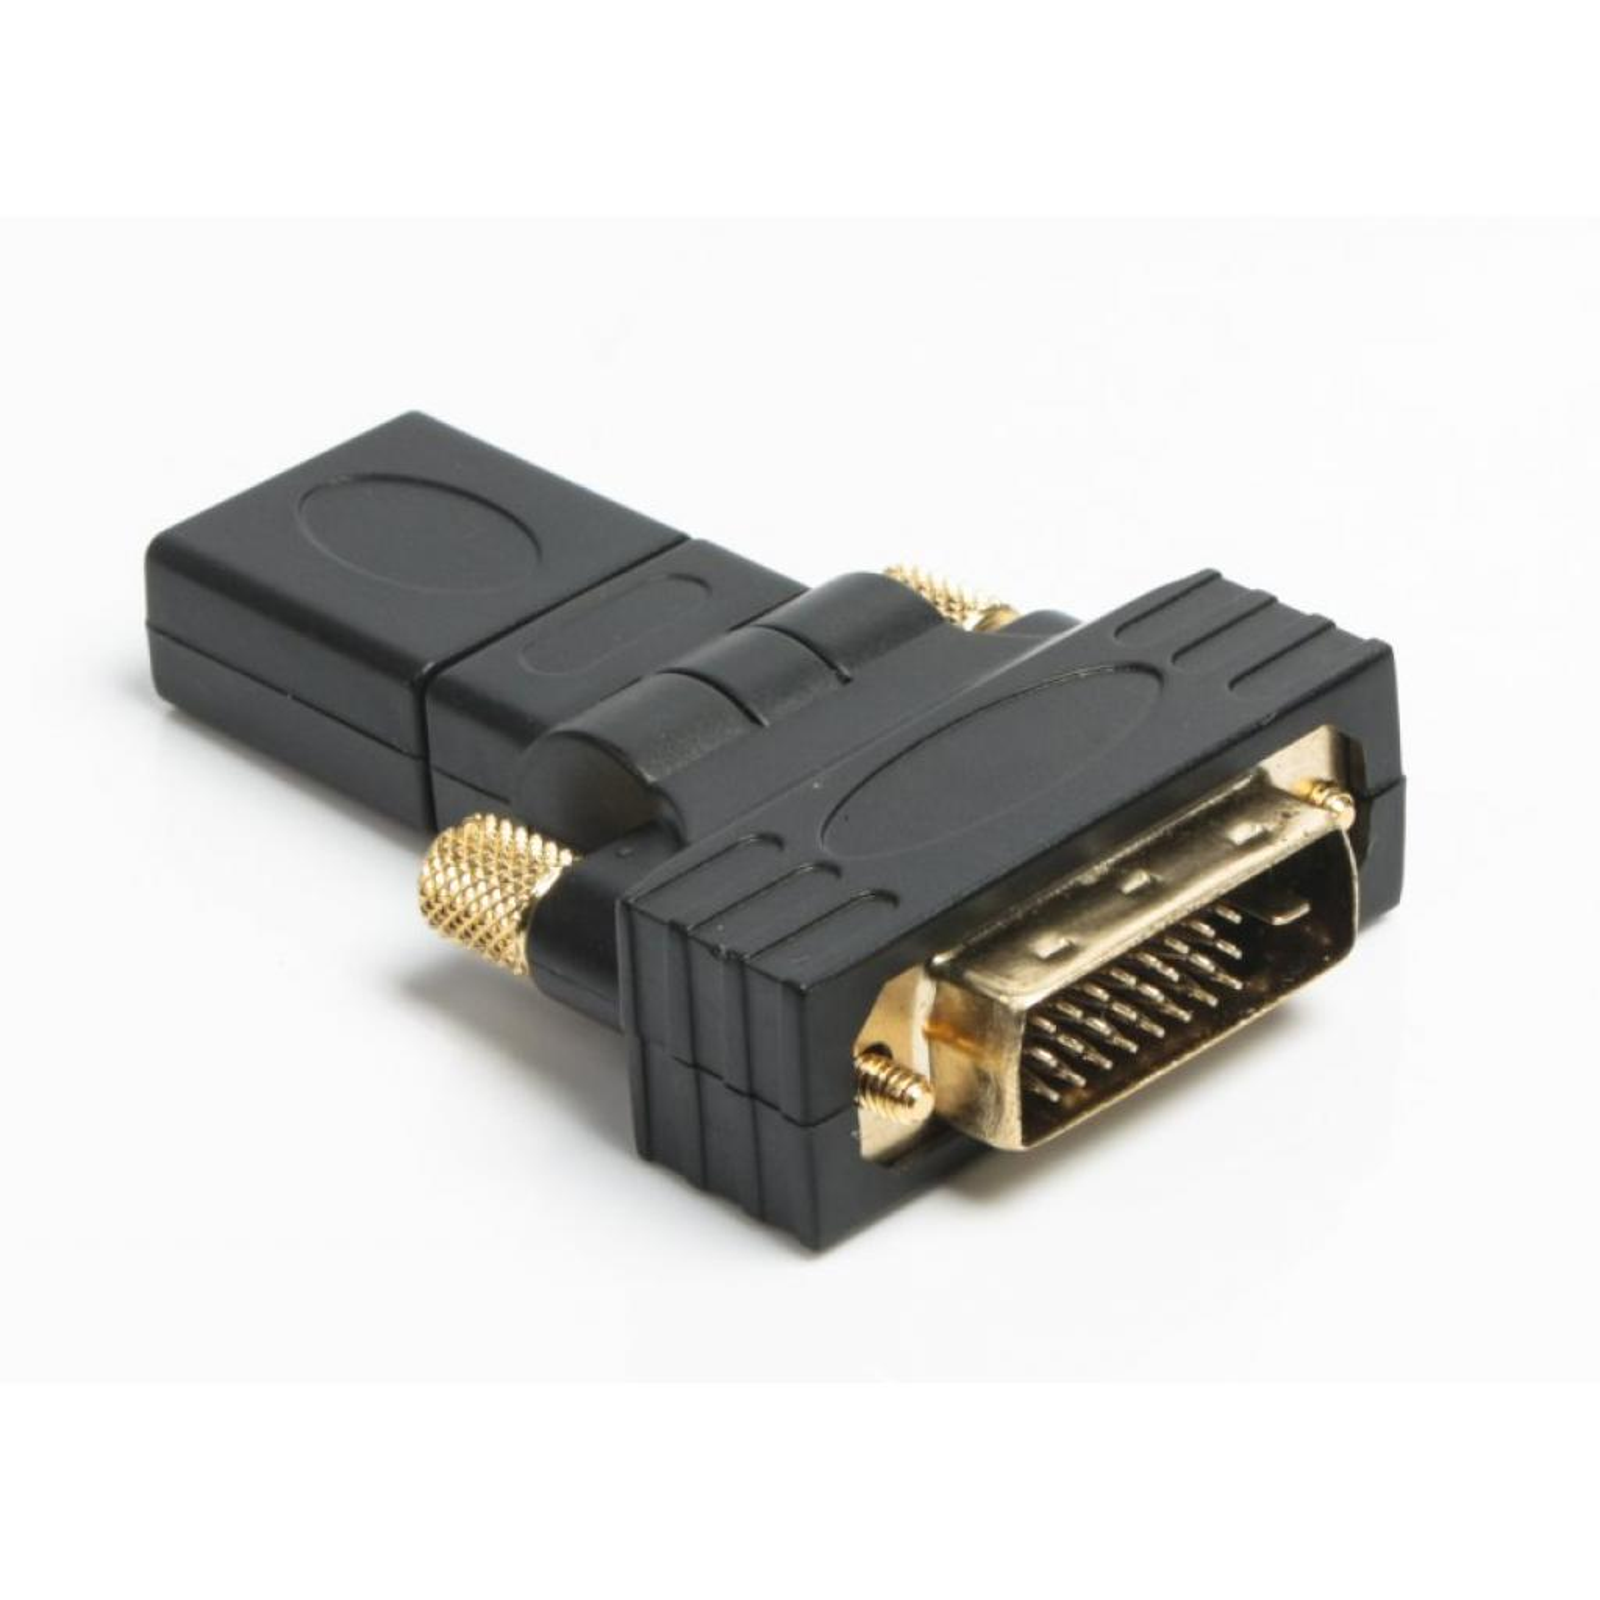 Переходник HDMI AF to DVI M (24+1) Viewcon (VD 038 B)